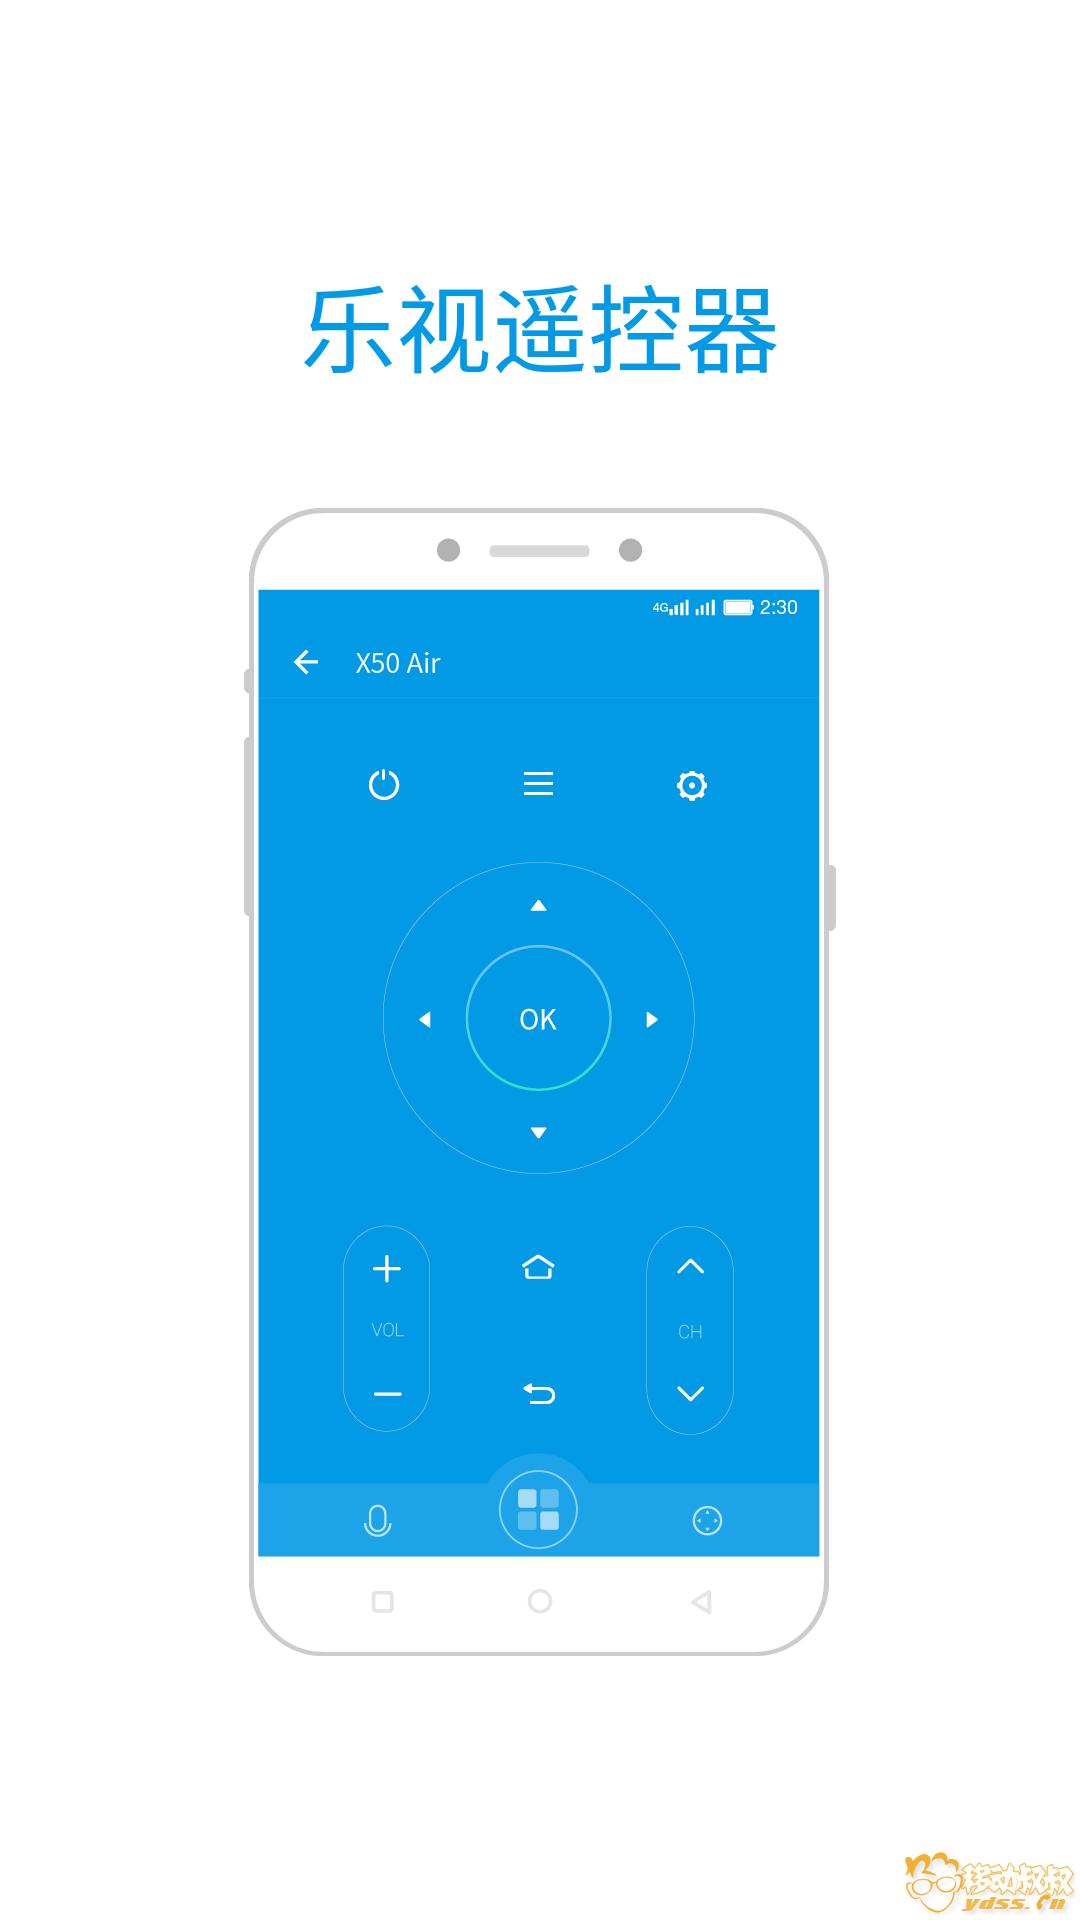 Screenshot_2017-08-12-13-27-20-666_com.letv.android.remotecontrol.png